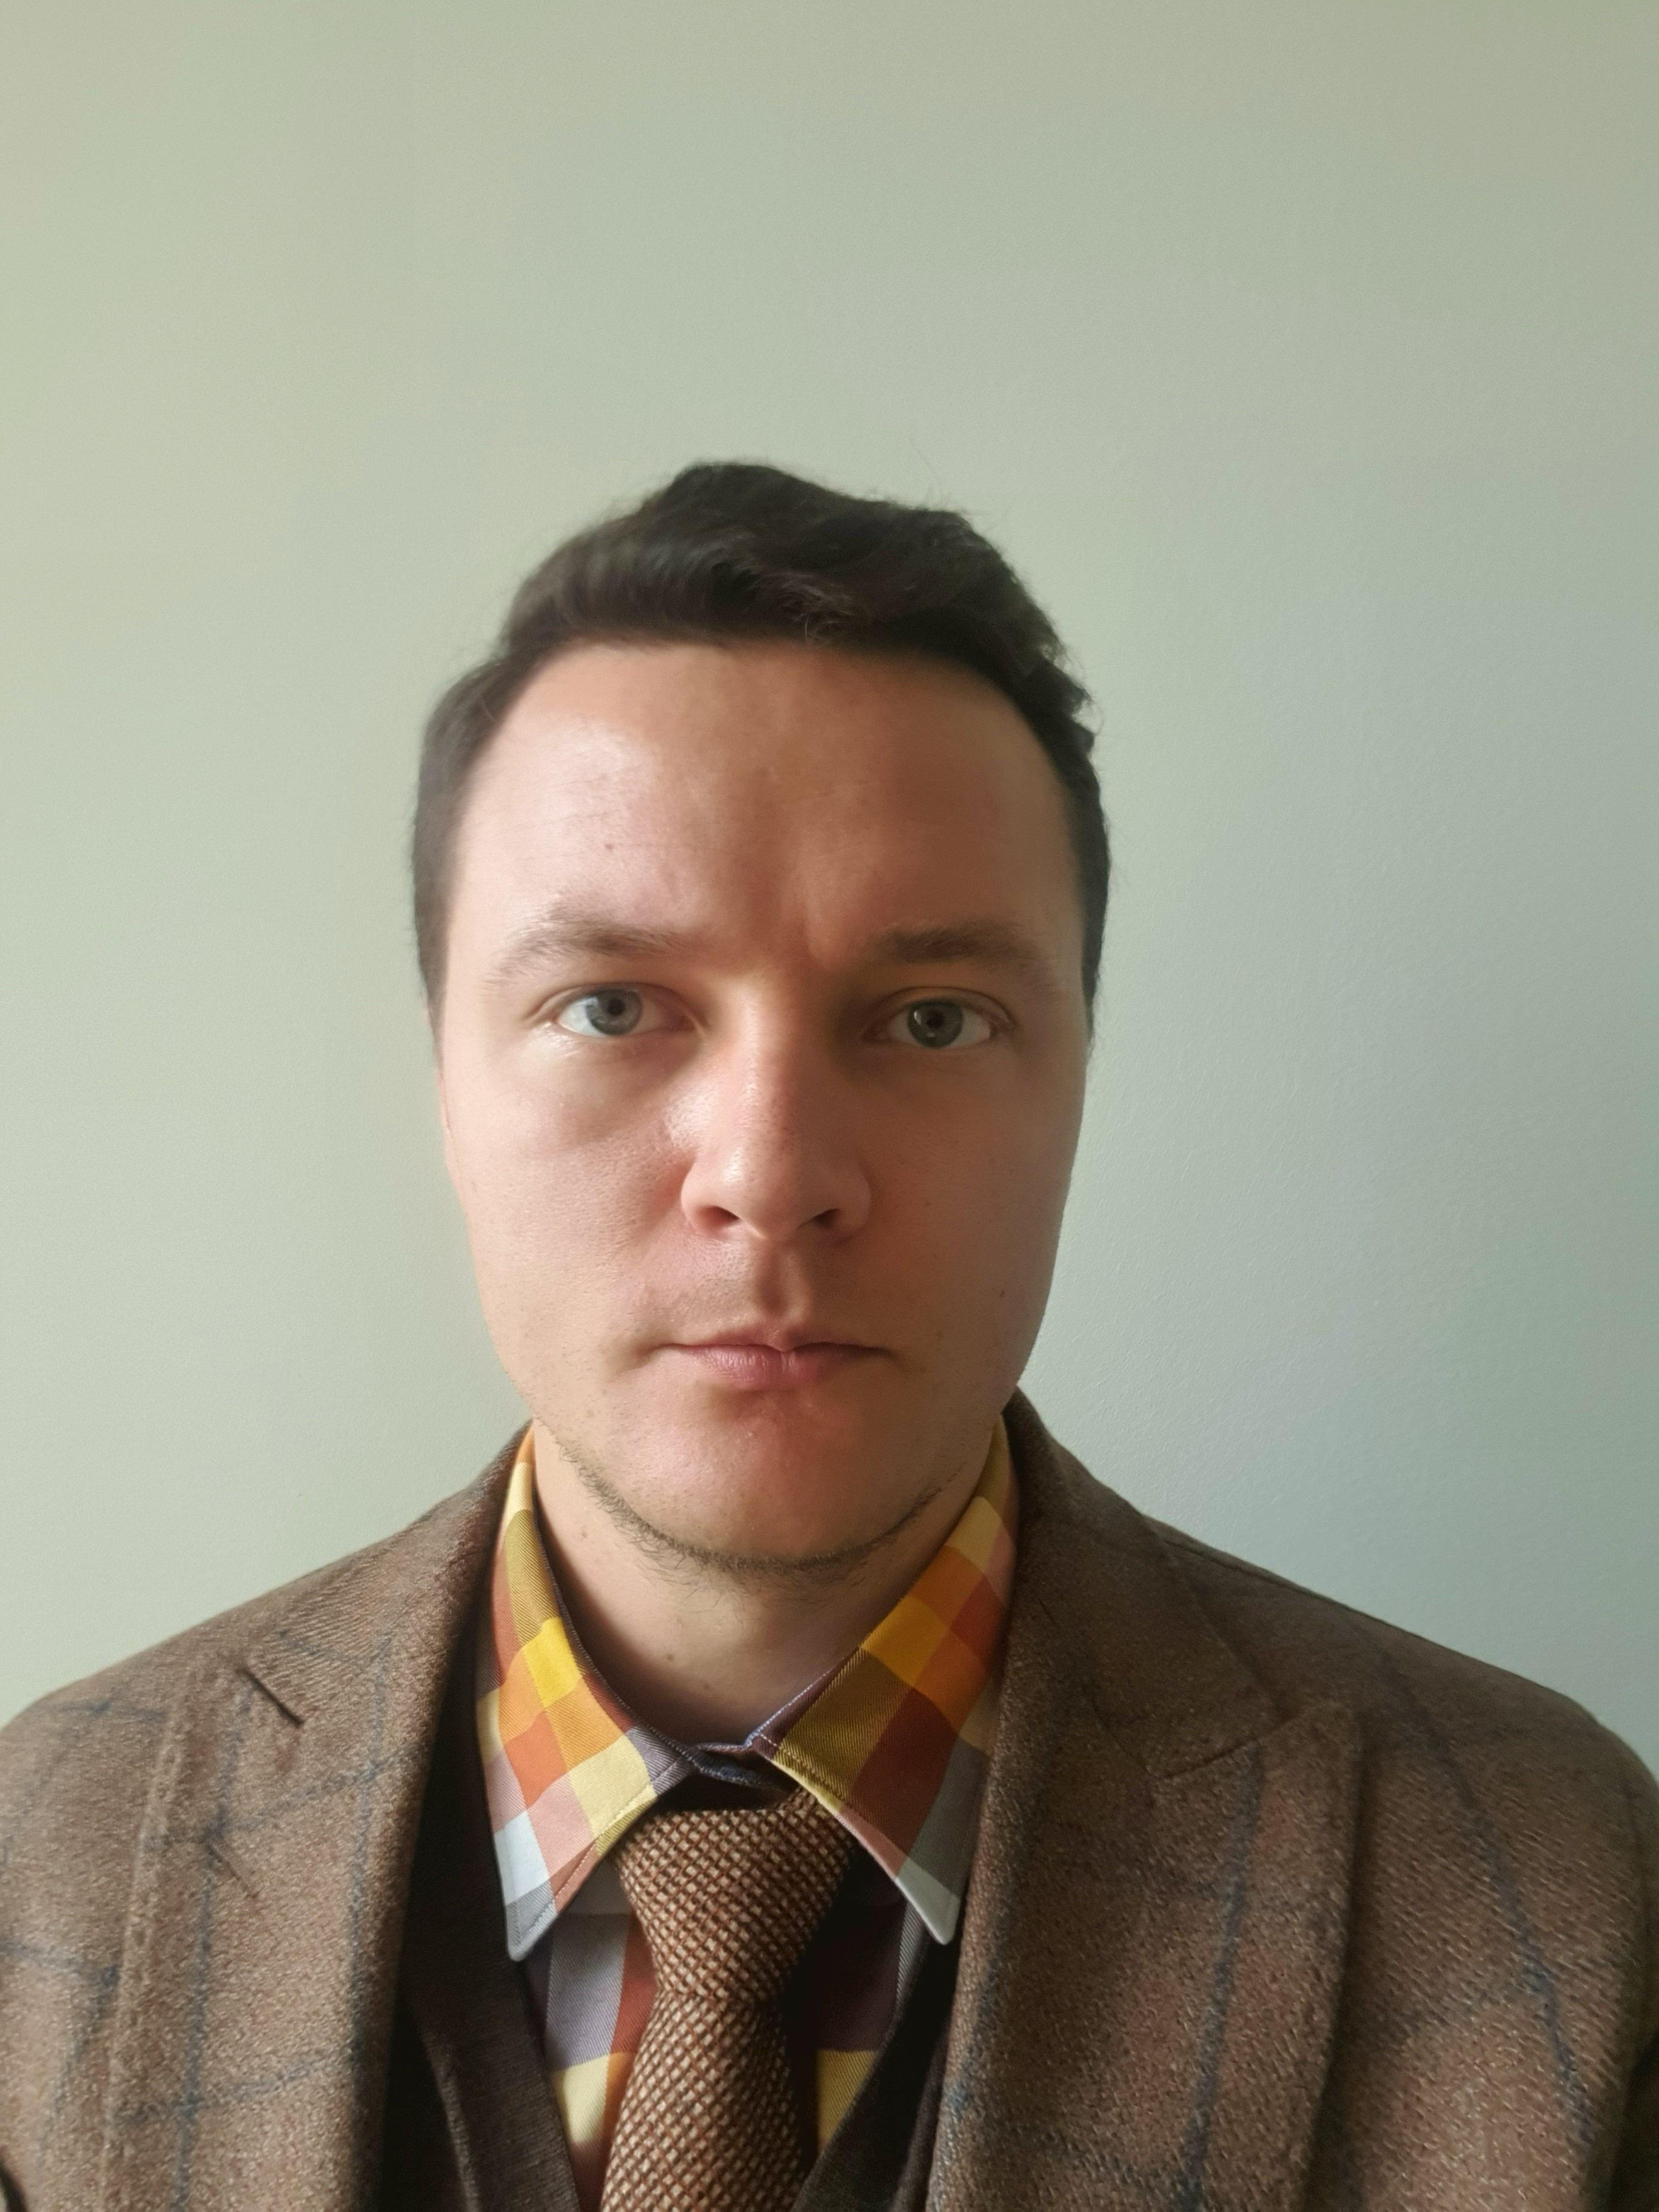 Anatolijs Belenkins